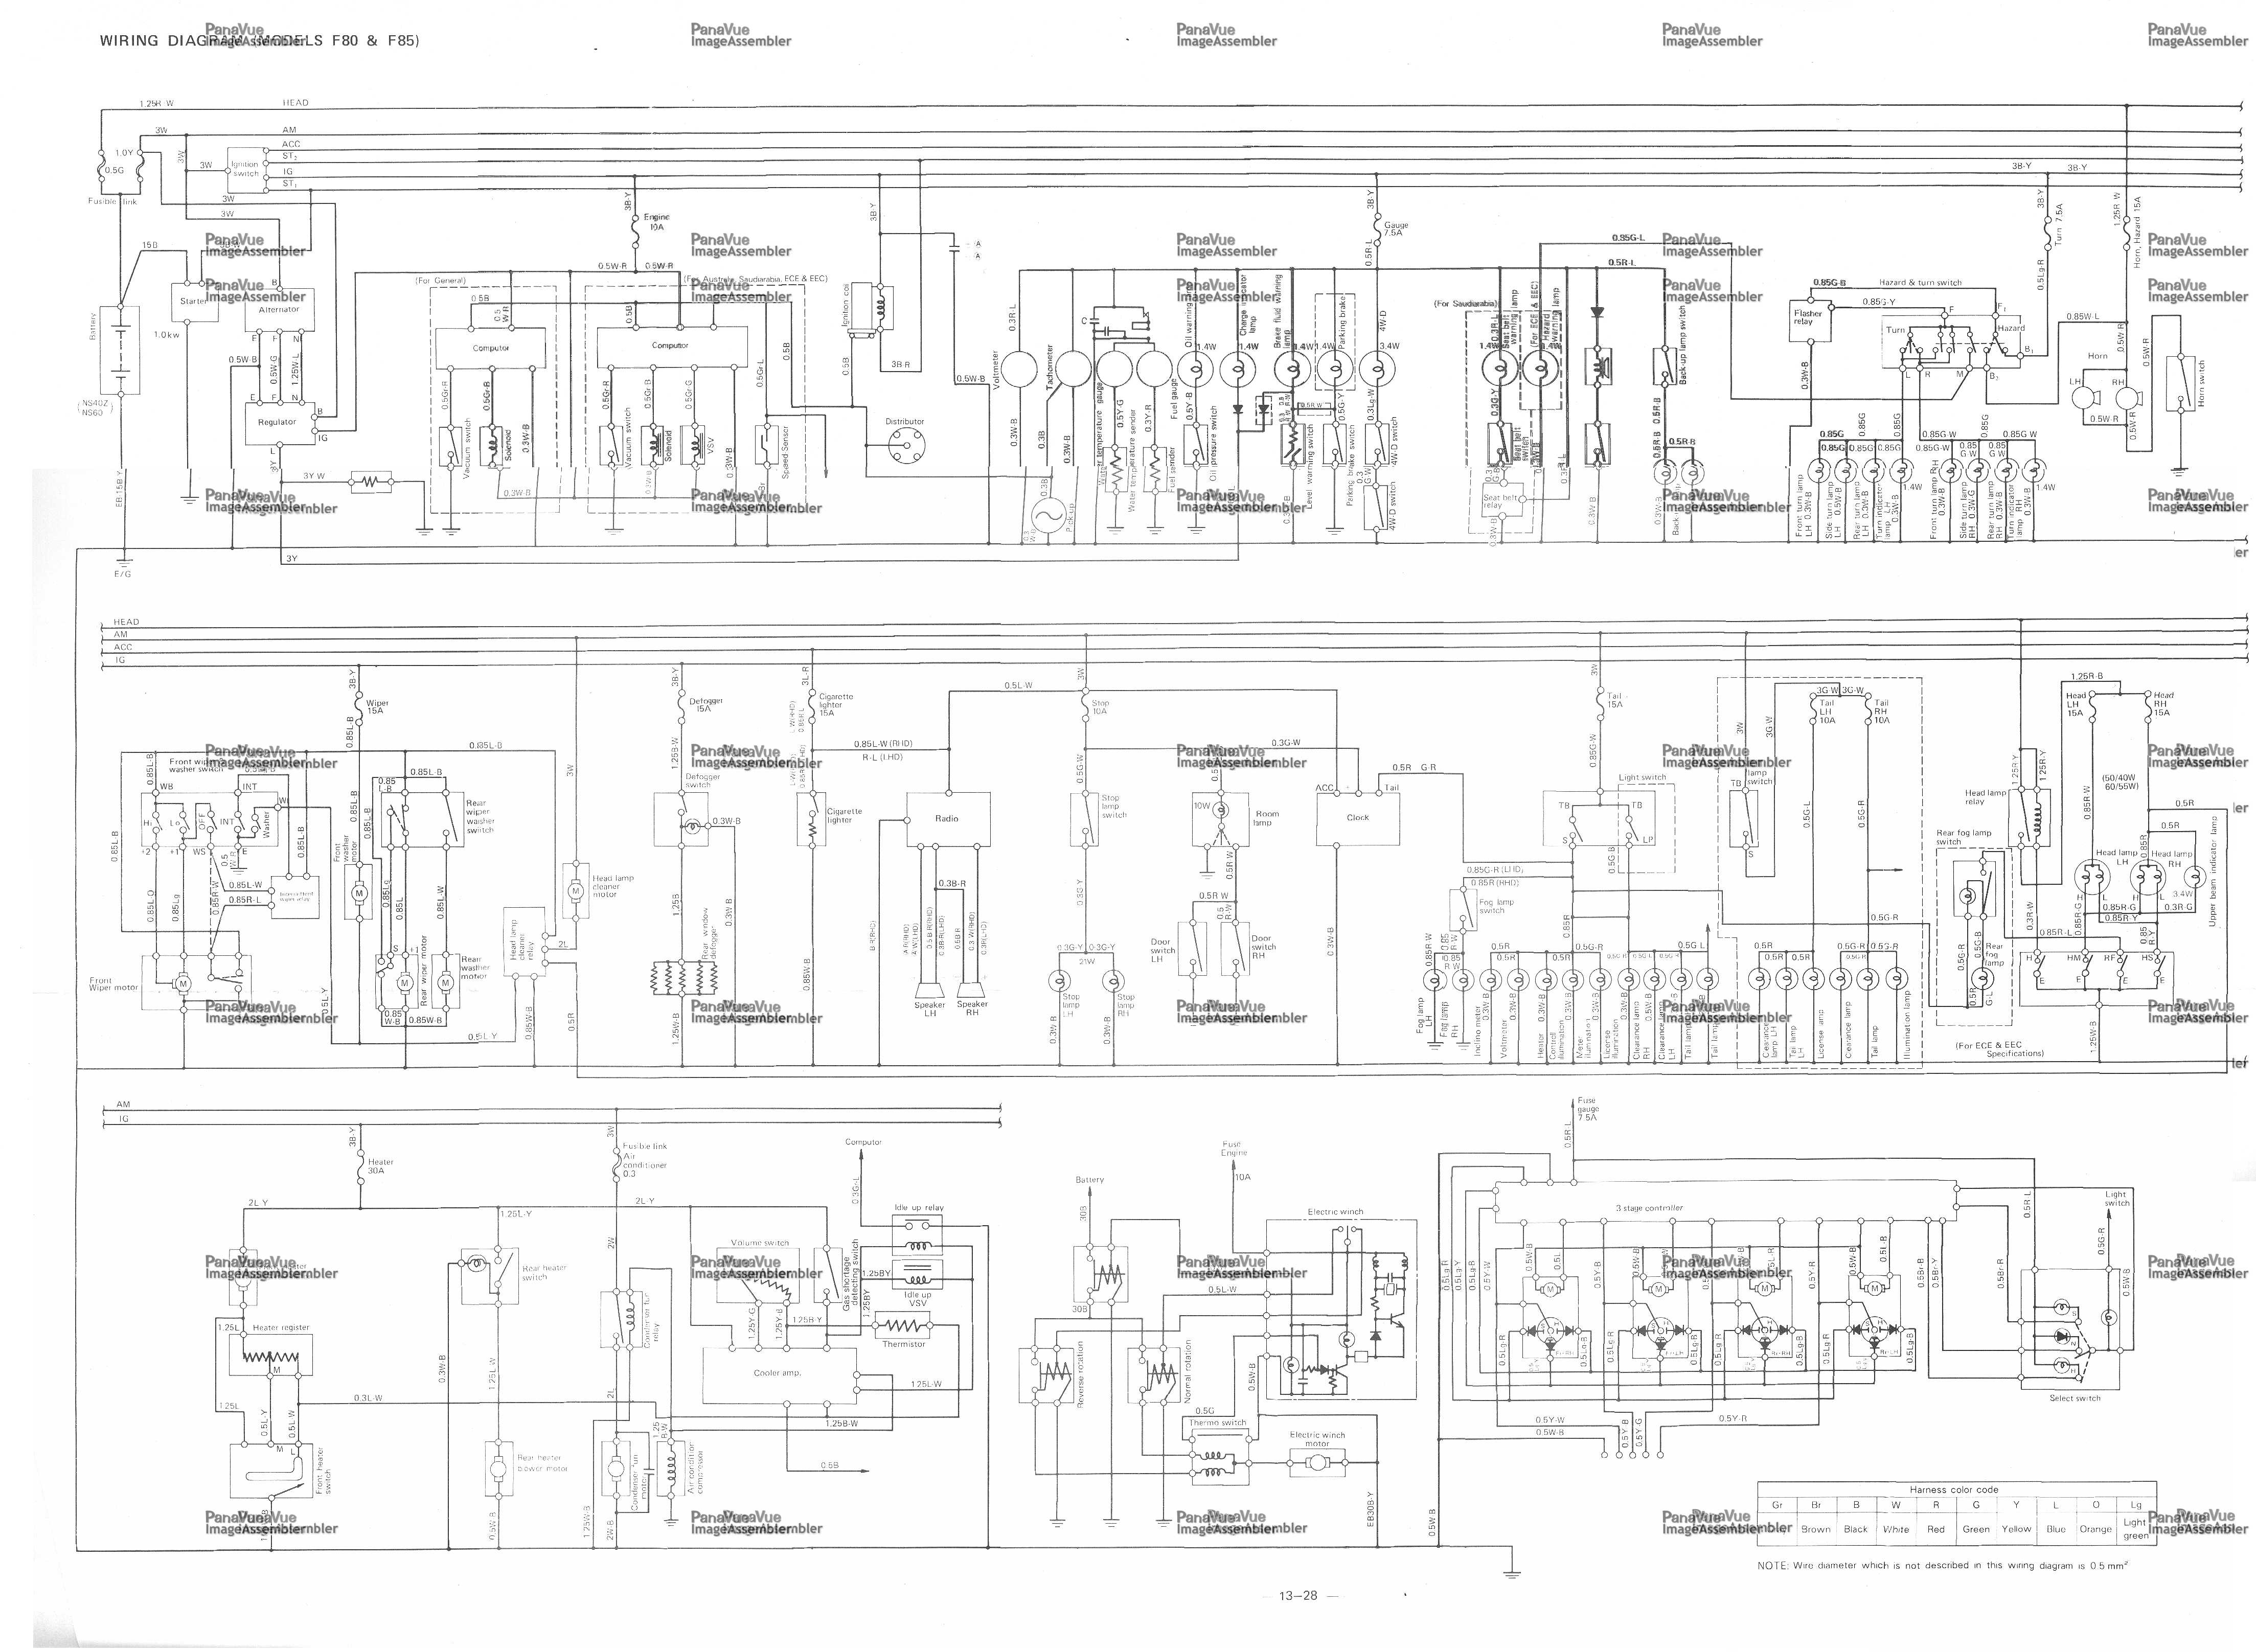 Daihatsu+Wiring+Diagram+F80 F85?t\=1497195765 daihatsu engine wiring diagram wiring diagram byblank Basic Electrical Wiring Diagrams at suagrazia.org